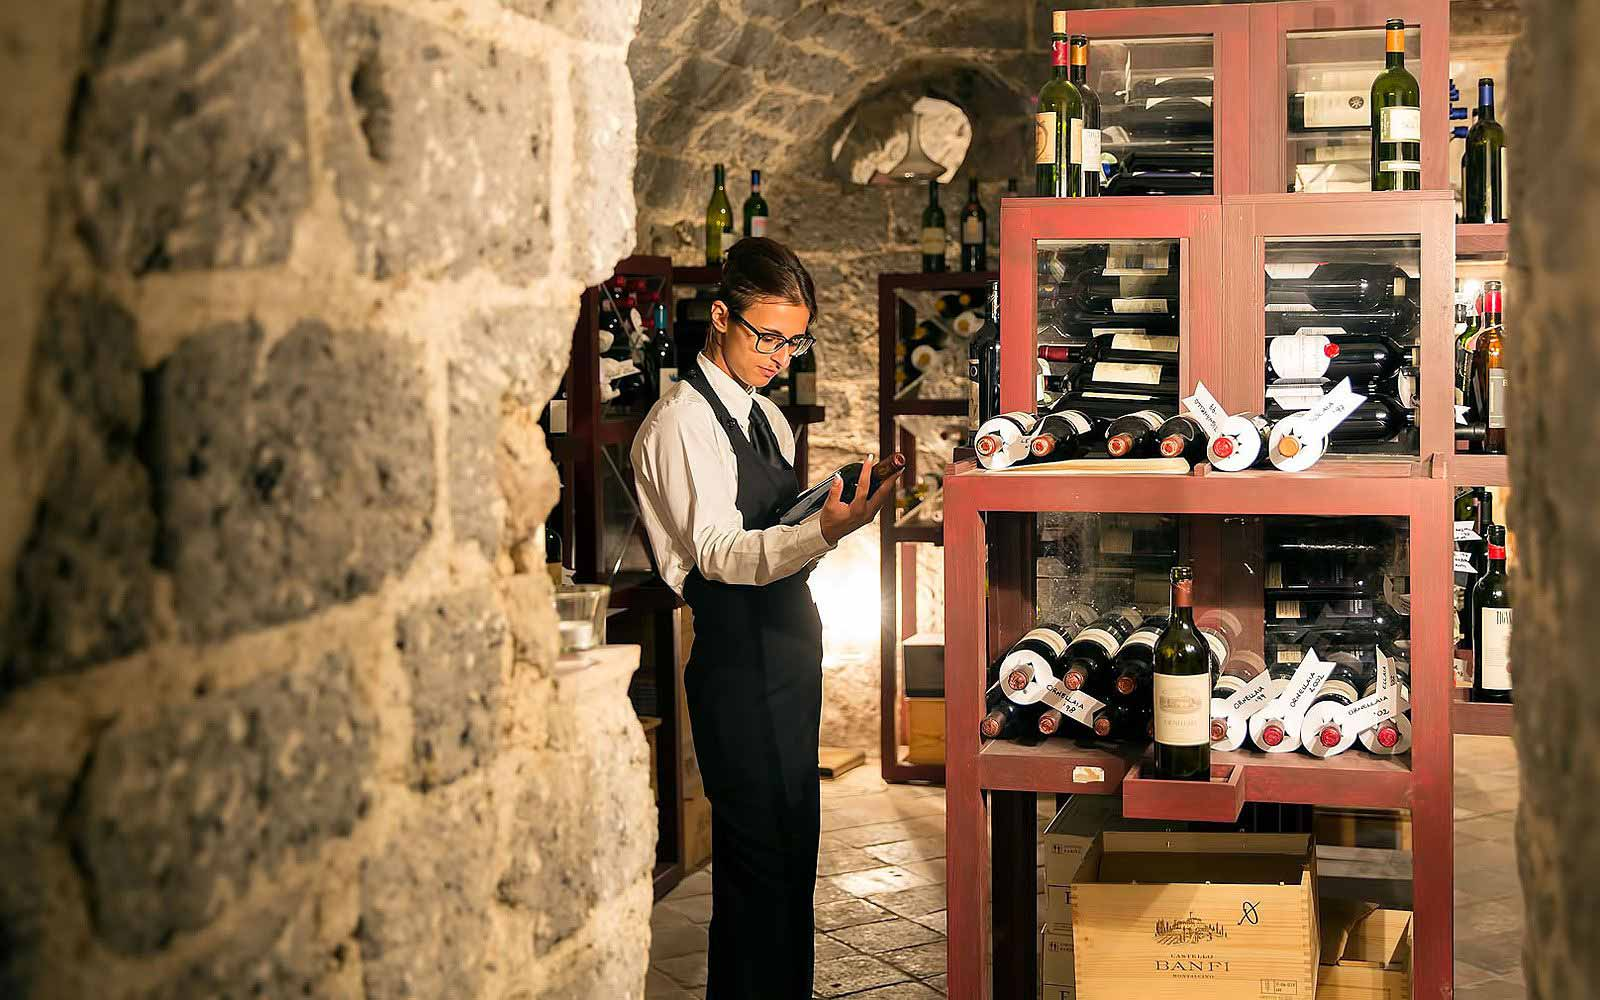 Wine cellar at Hotel Bellevue Syrene